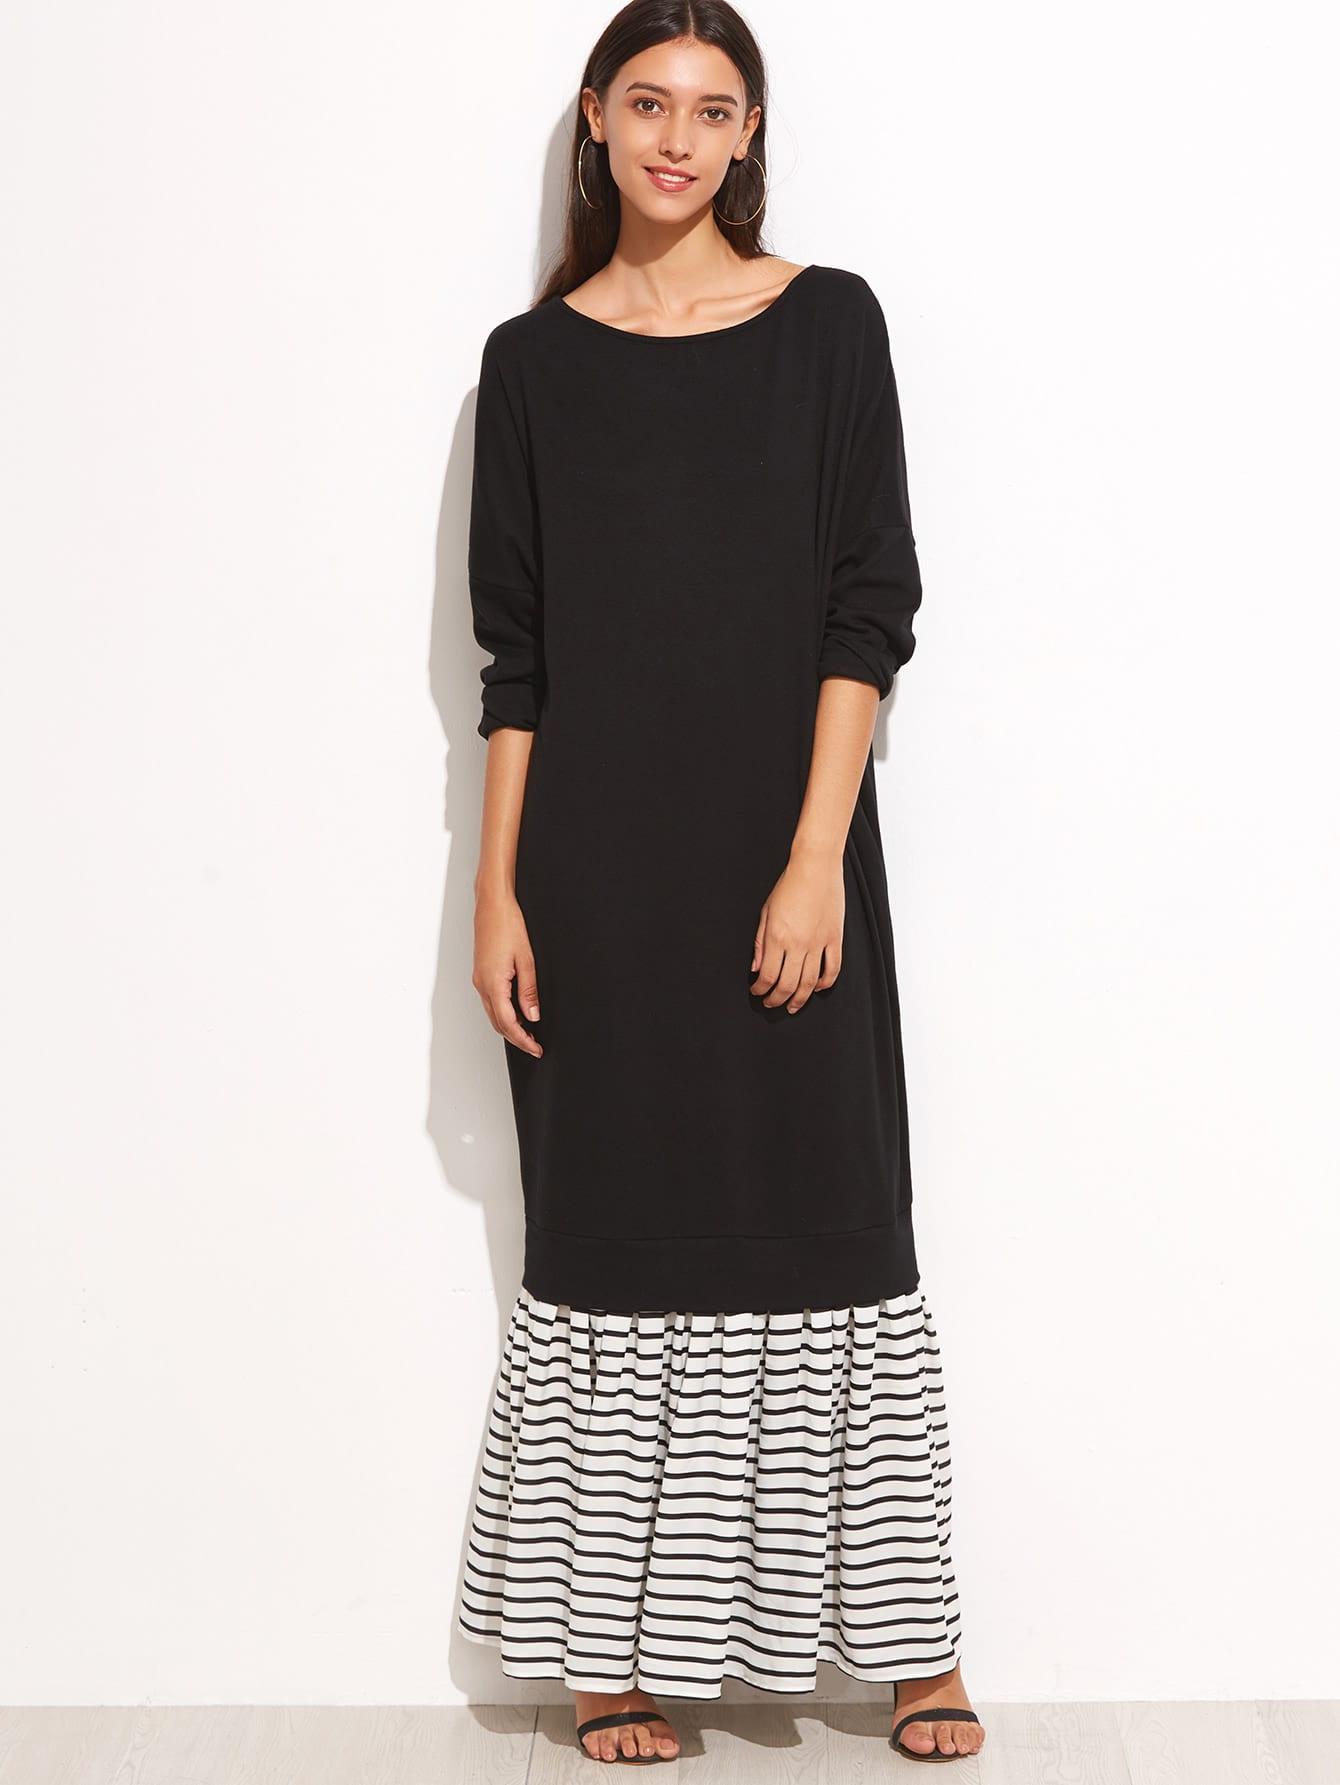 Black Contrast Striped Trim Sweatshirt Dress dress160909701